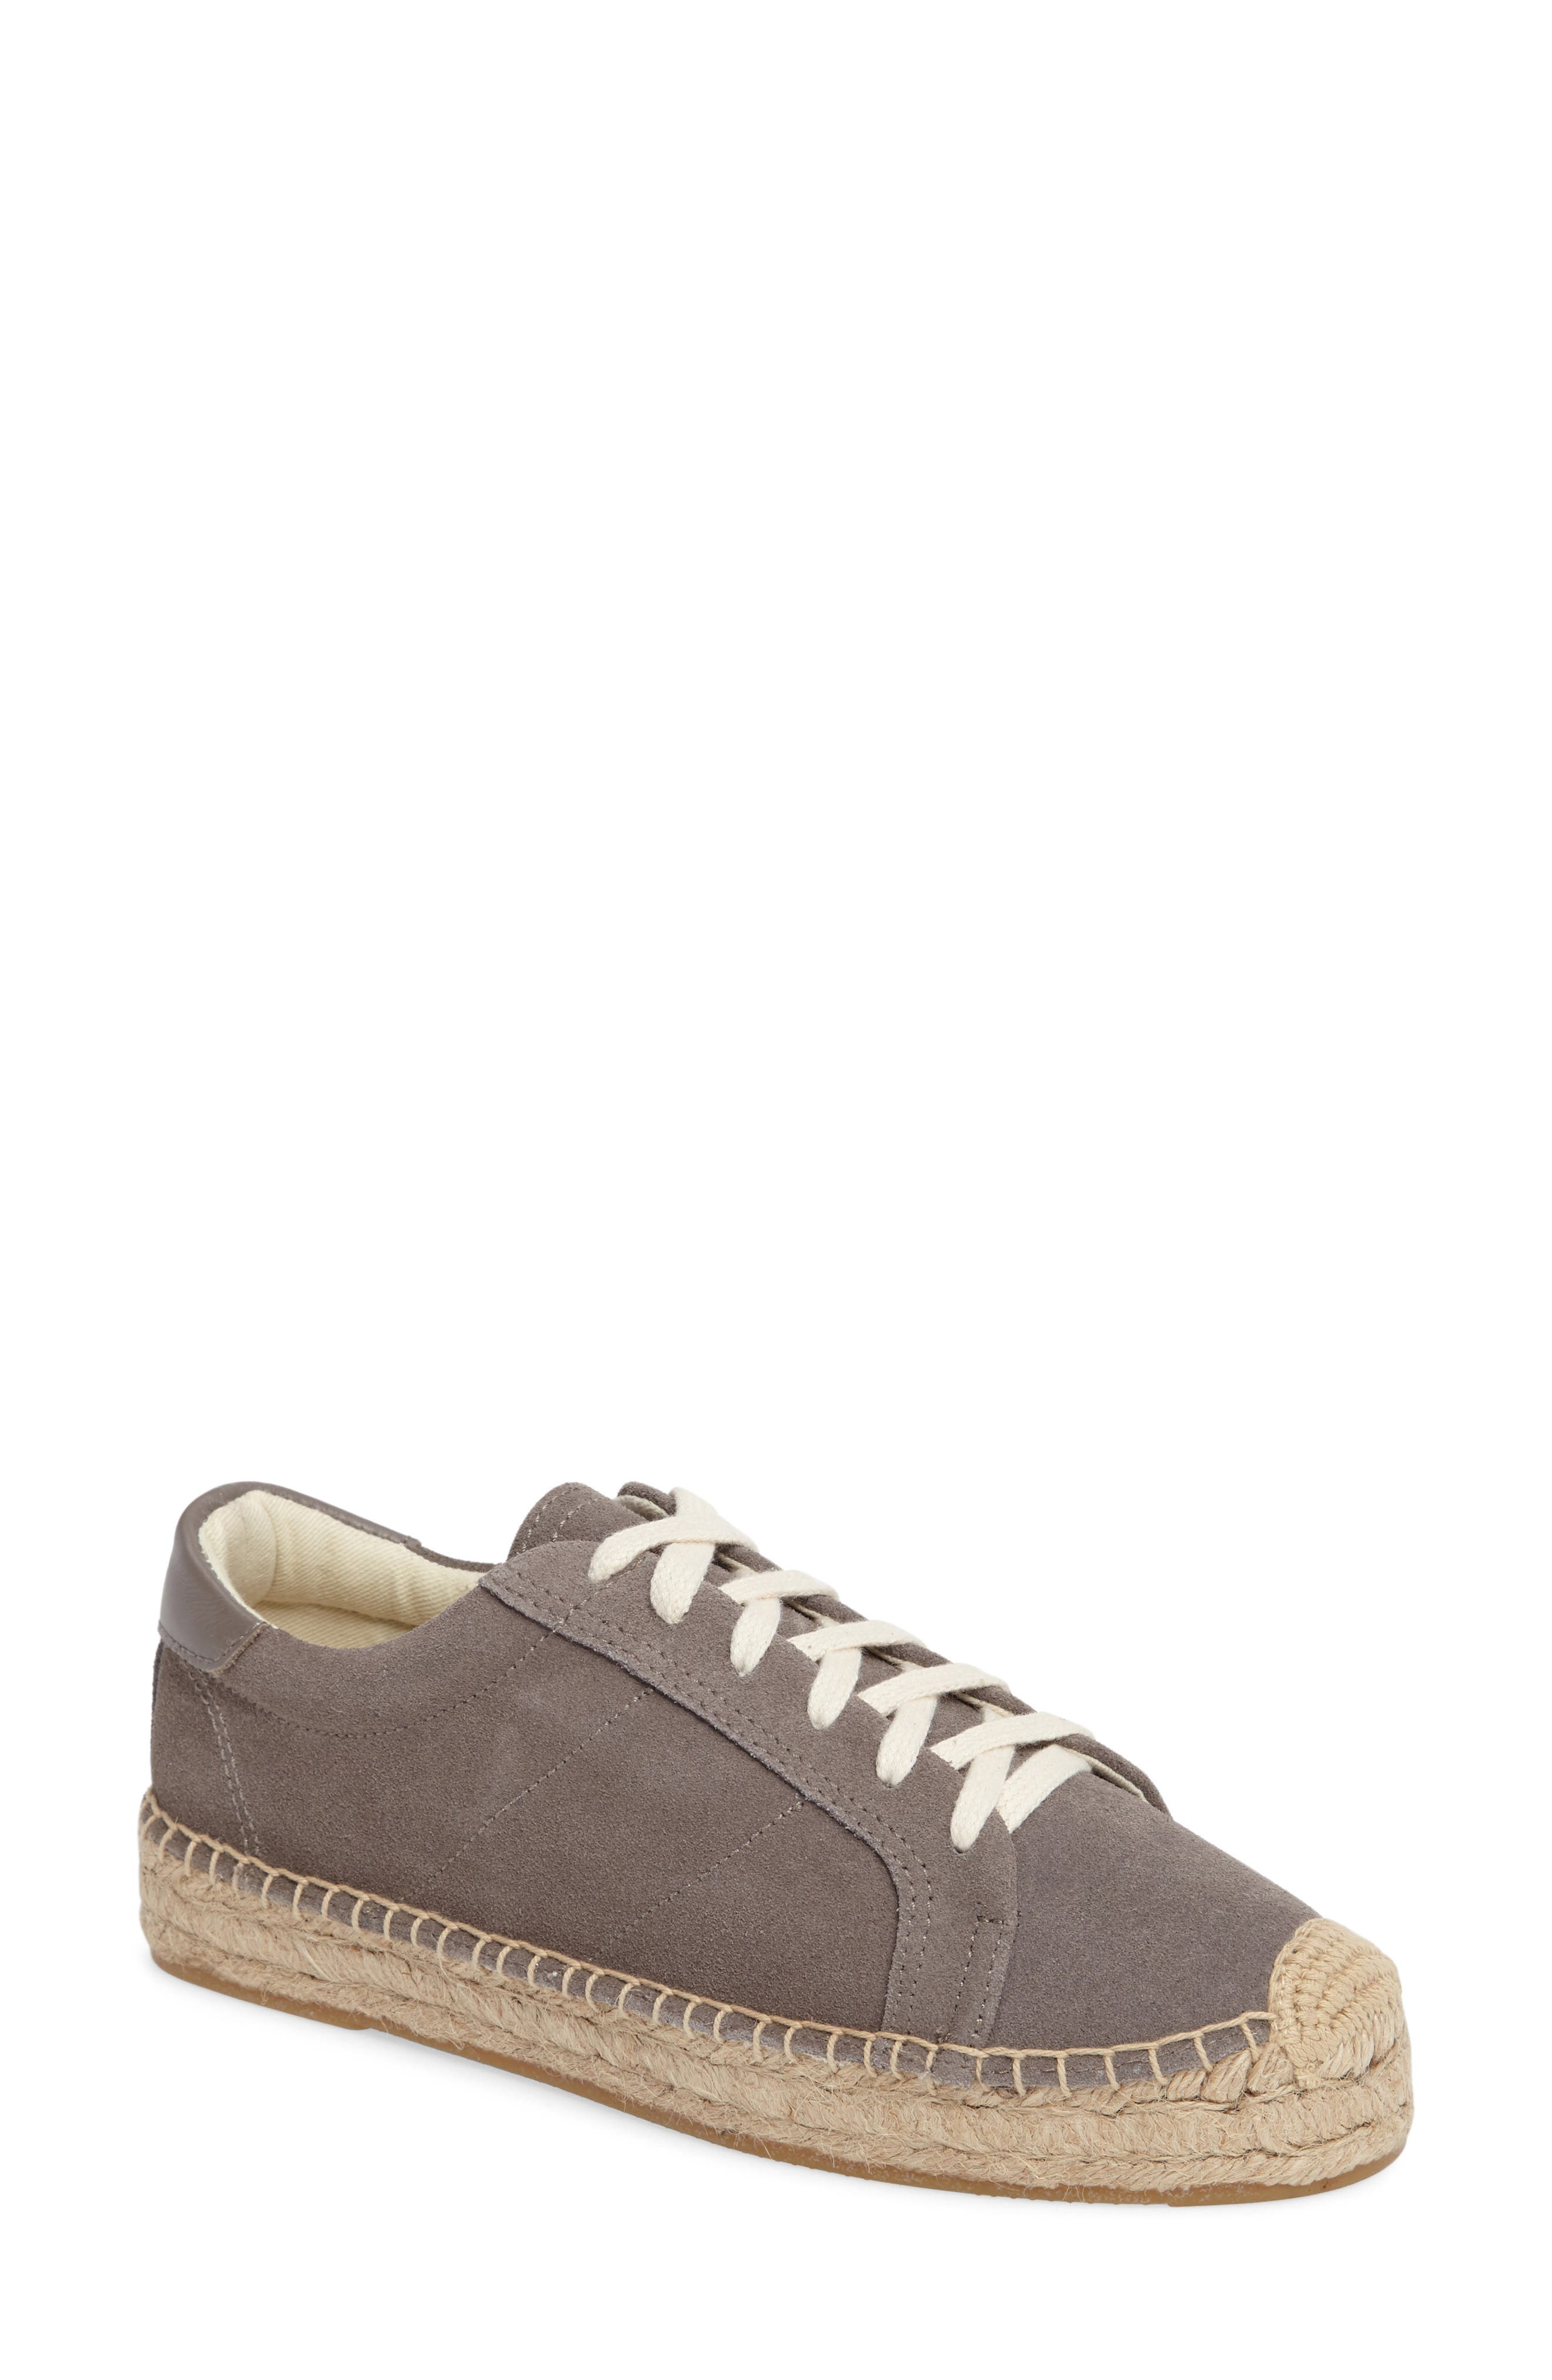 Soludos Espadrille Sneaker (Women)